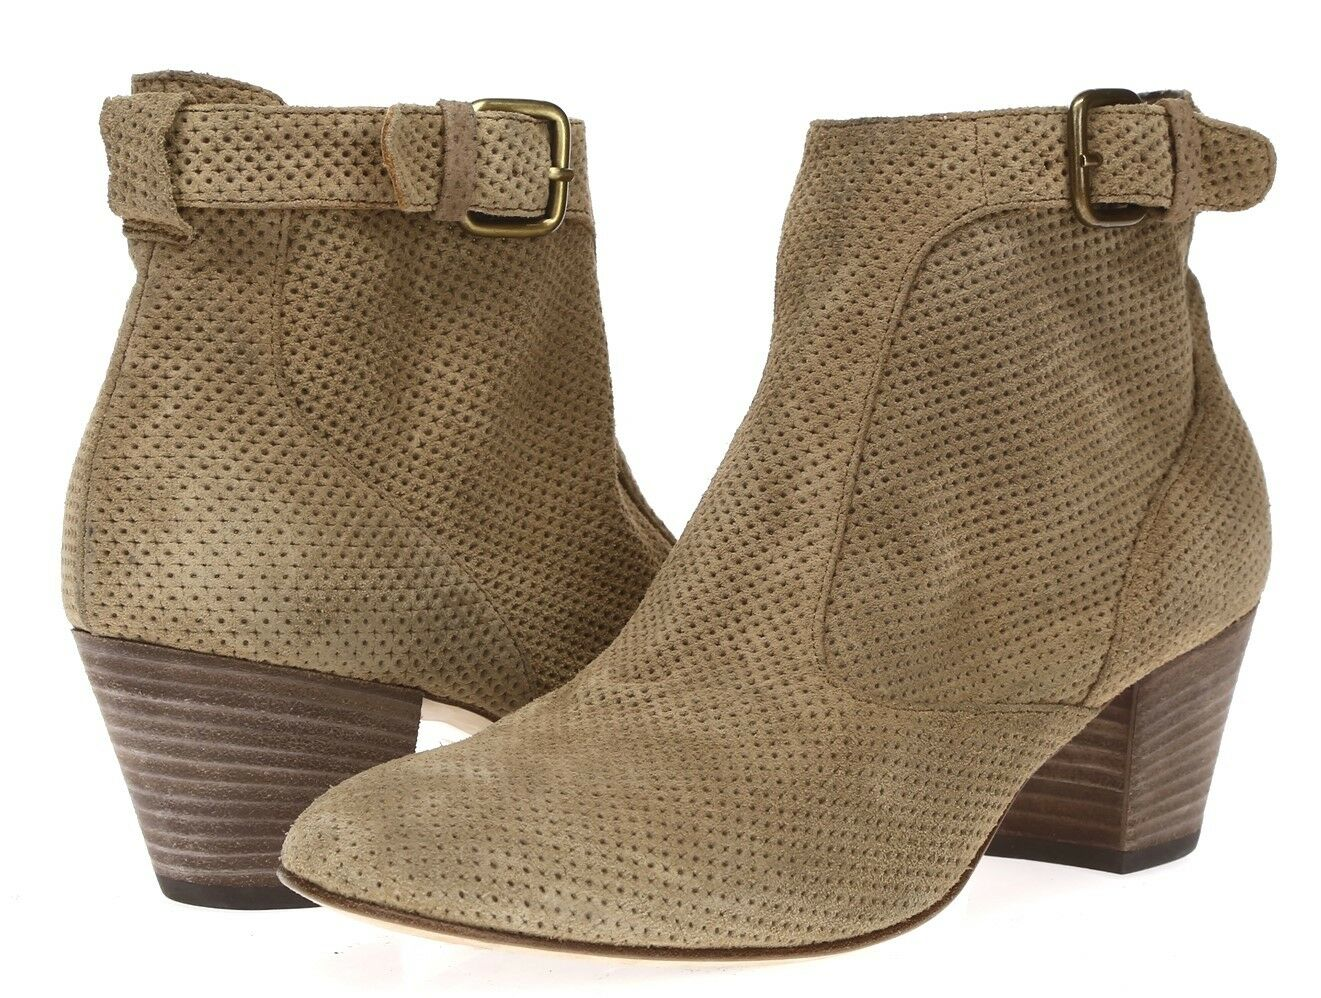 Aquatalia mujer Dark Beige Beige Beige Gamuza Tobillo botas talla 8.5  punto de venta